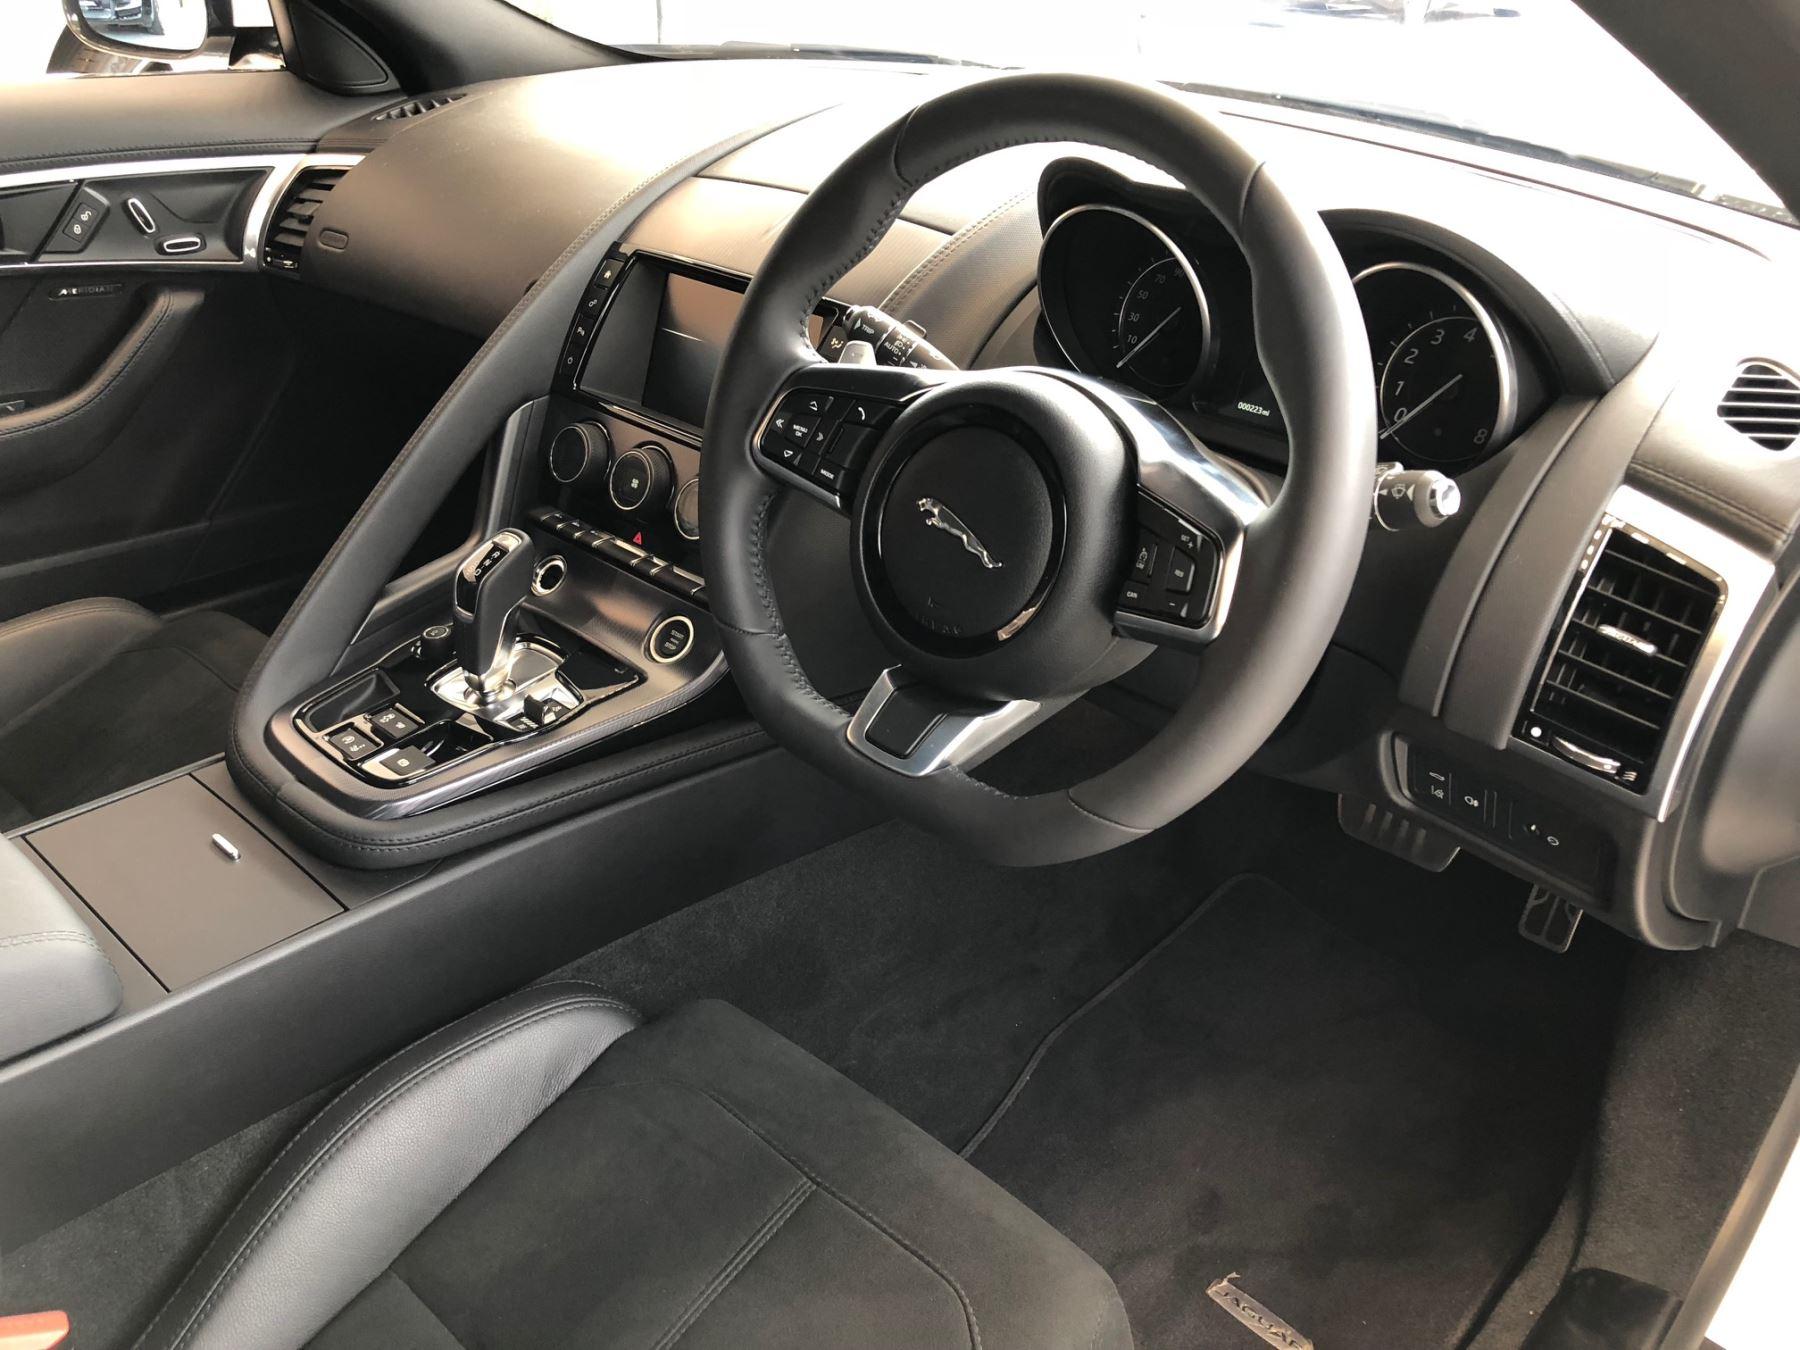 Jaguar F-TYPE 2.0 R-Dynamic image 4